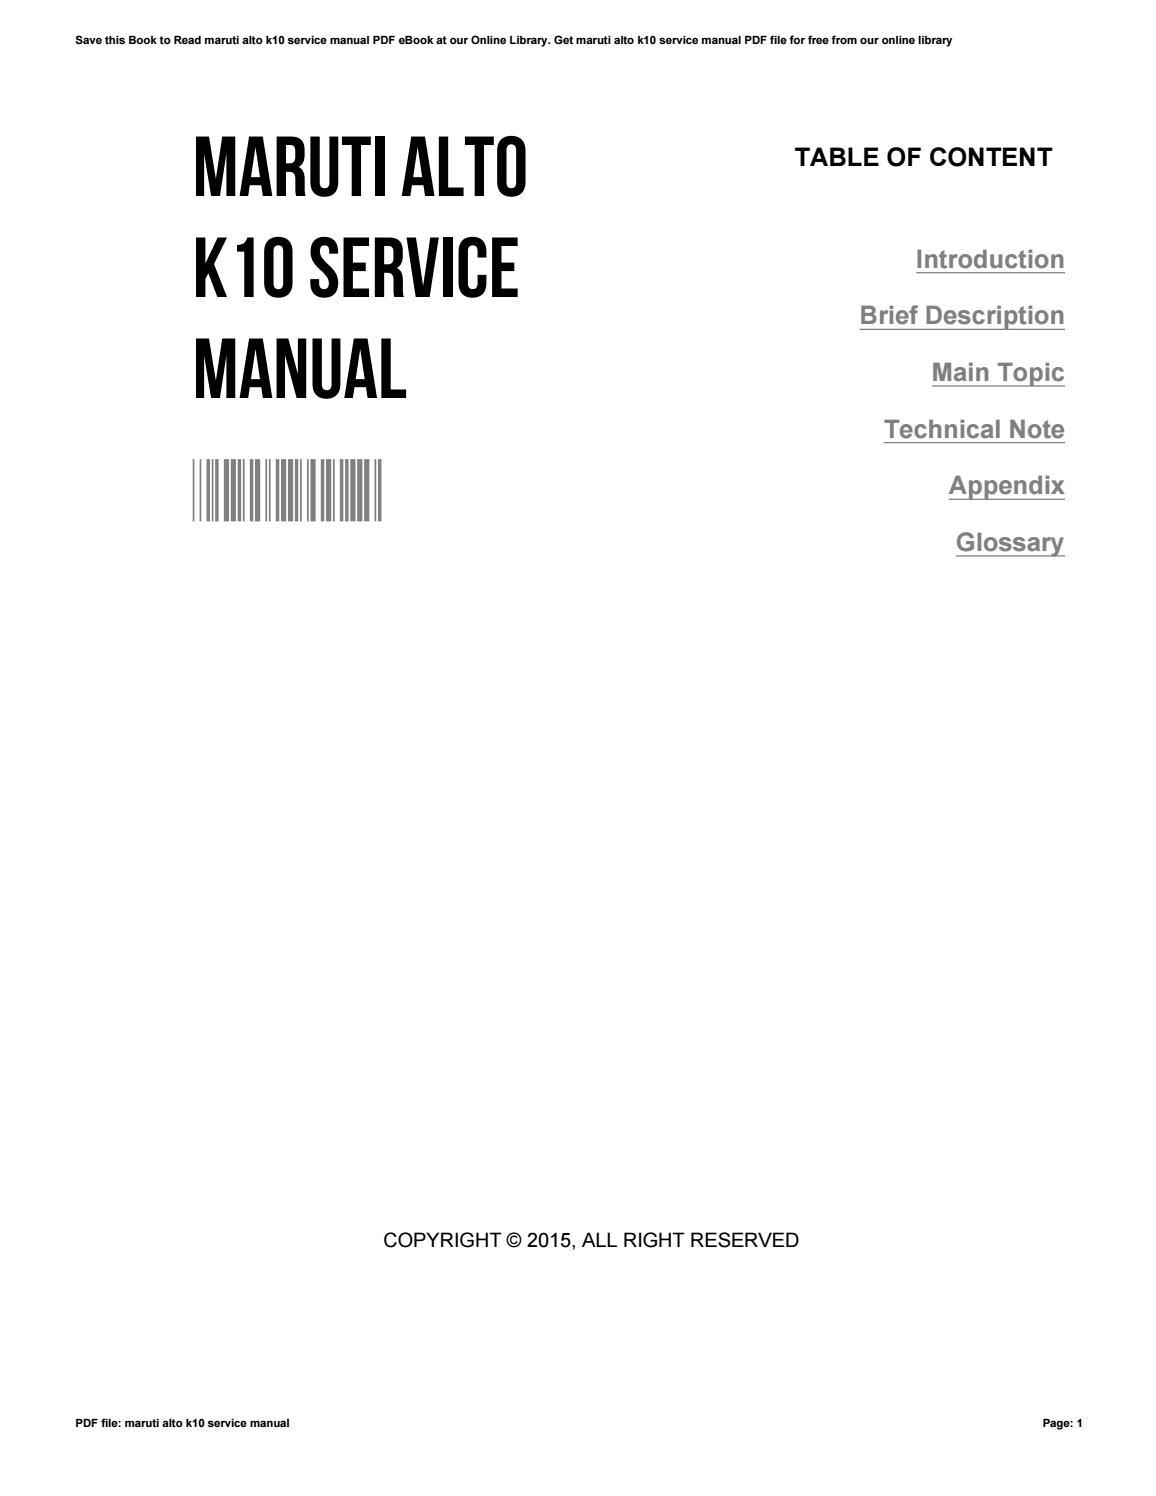 ... owners manual ebook fullybe Array - mazda tribute user manual ebook rh  mazda tribute user manual ebook angelayu us